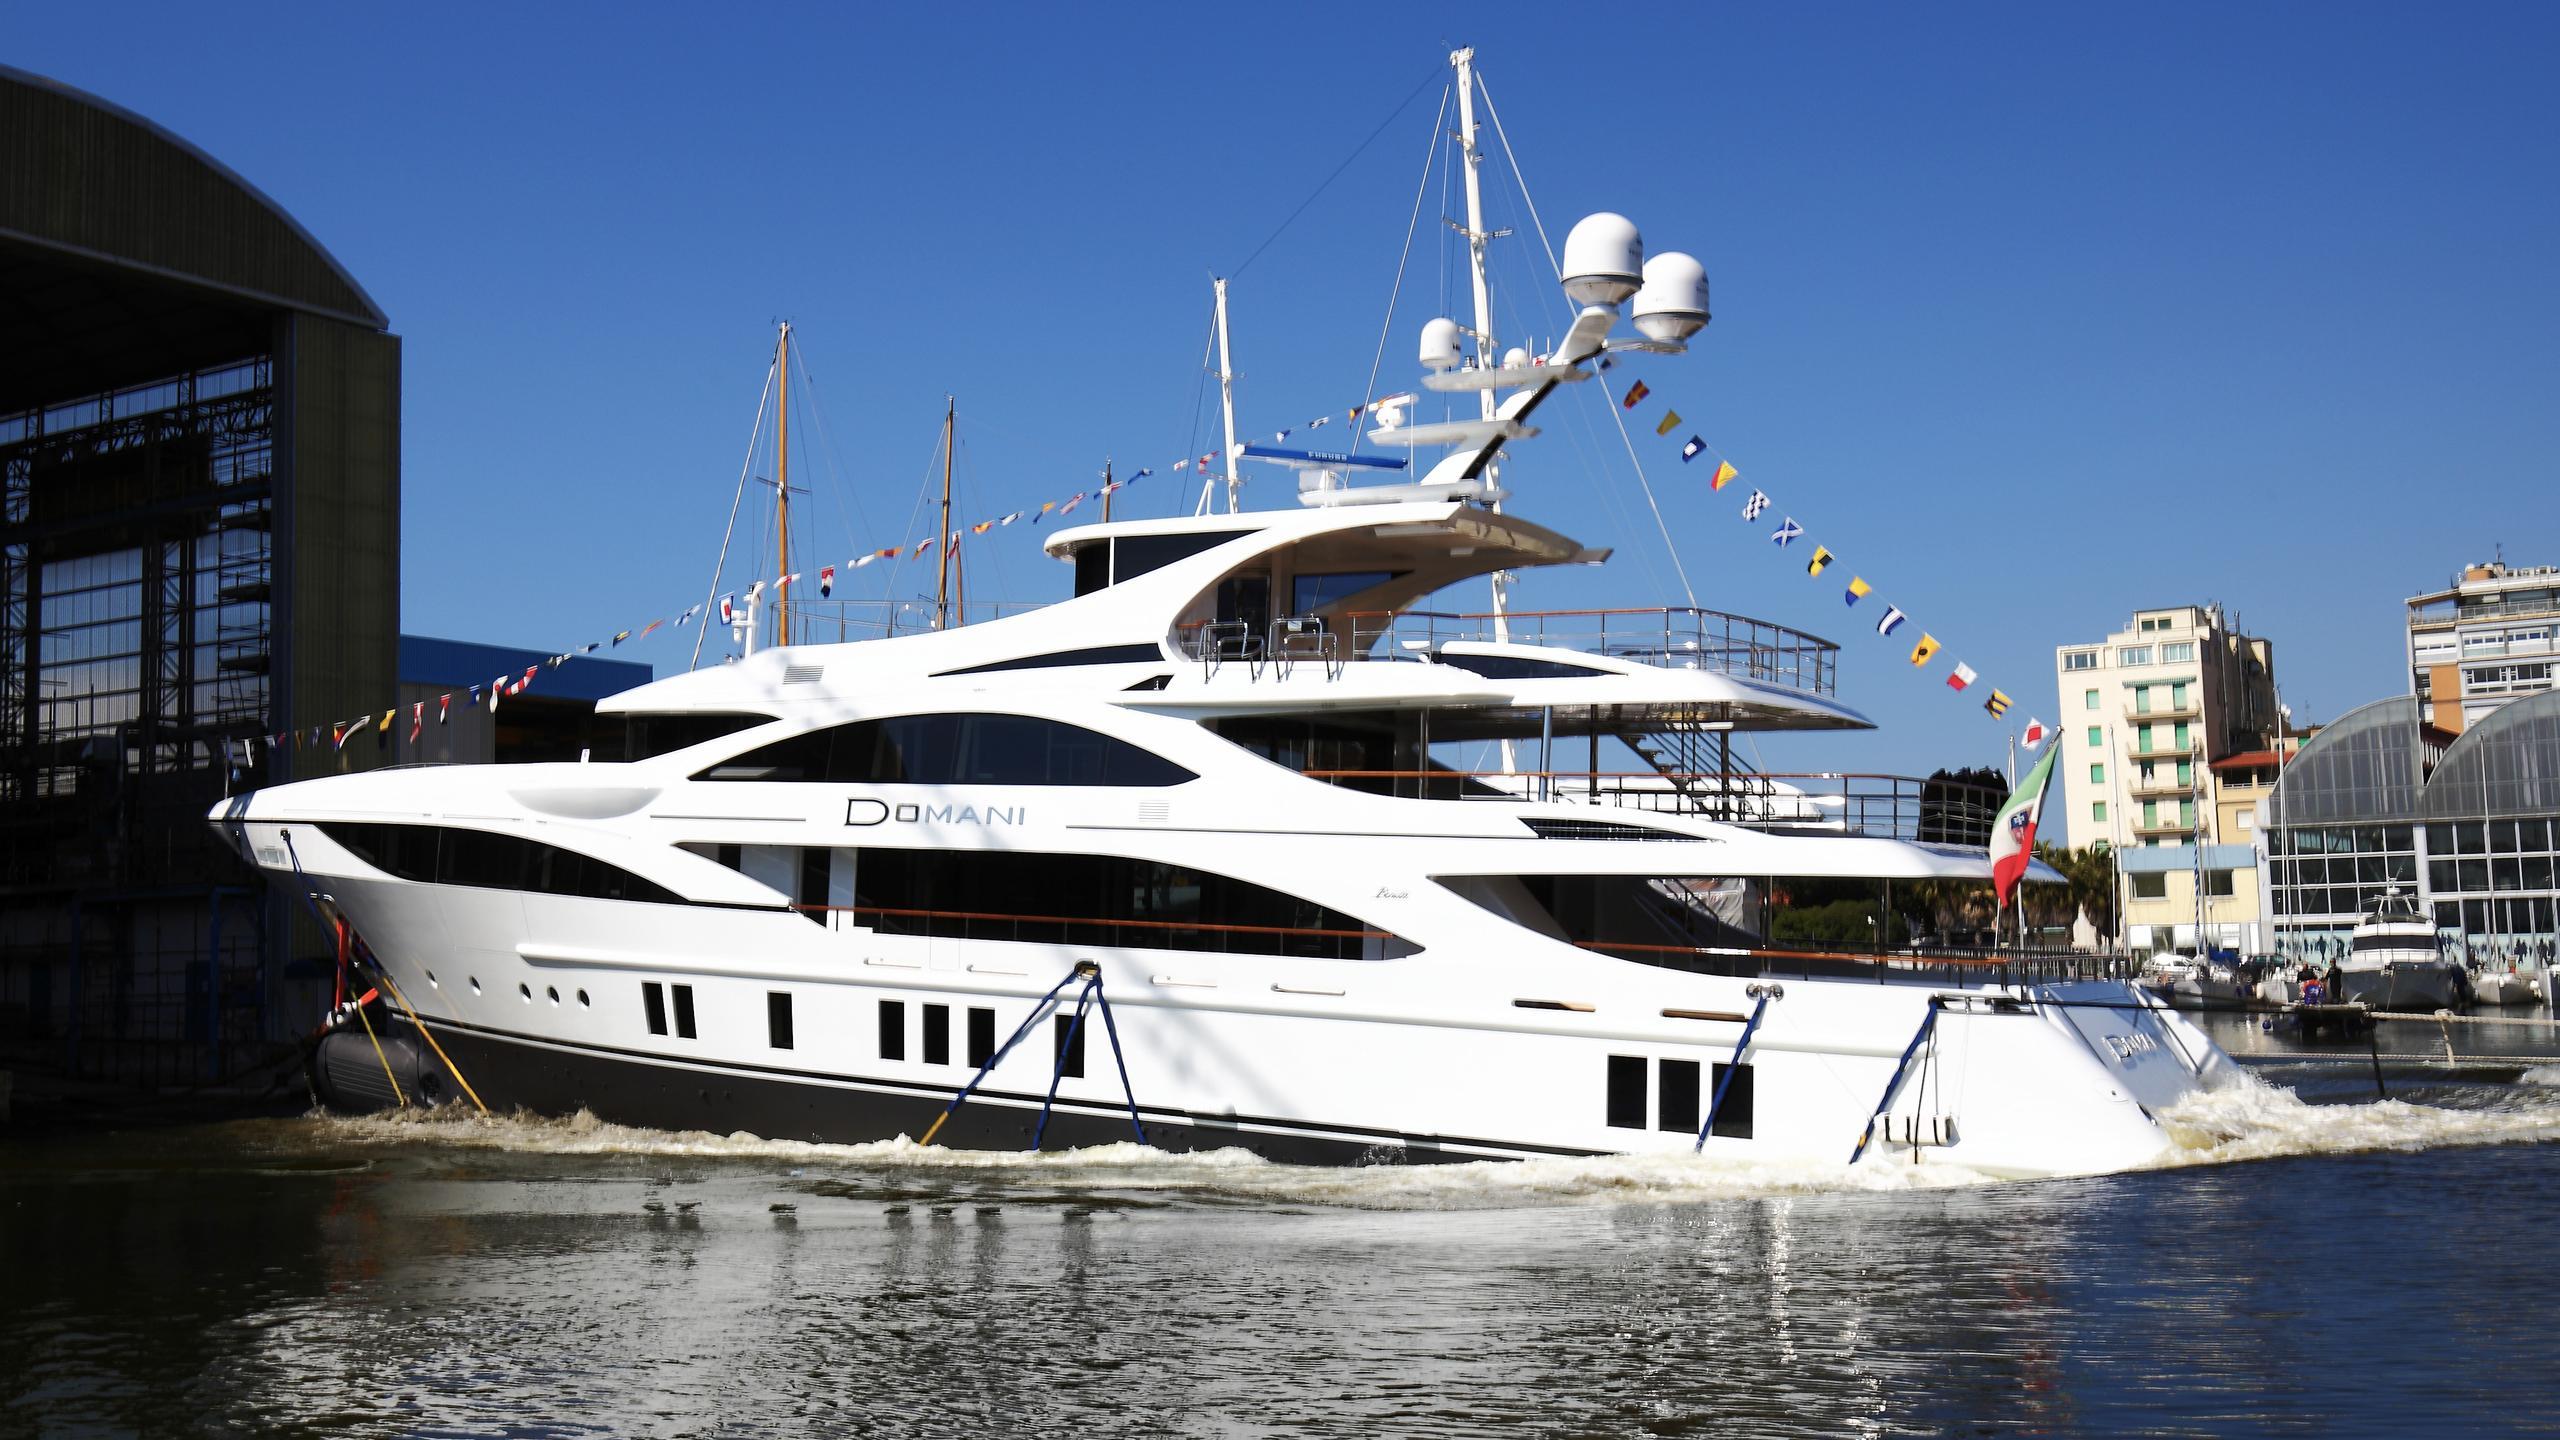 domani-motor-yacht-benetti-2016-42m-profile-launch